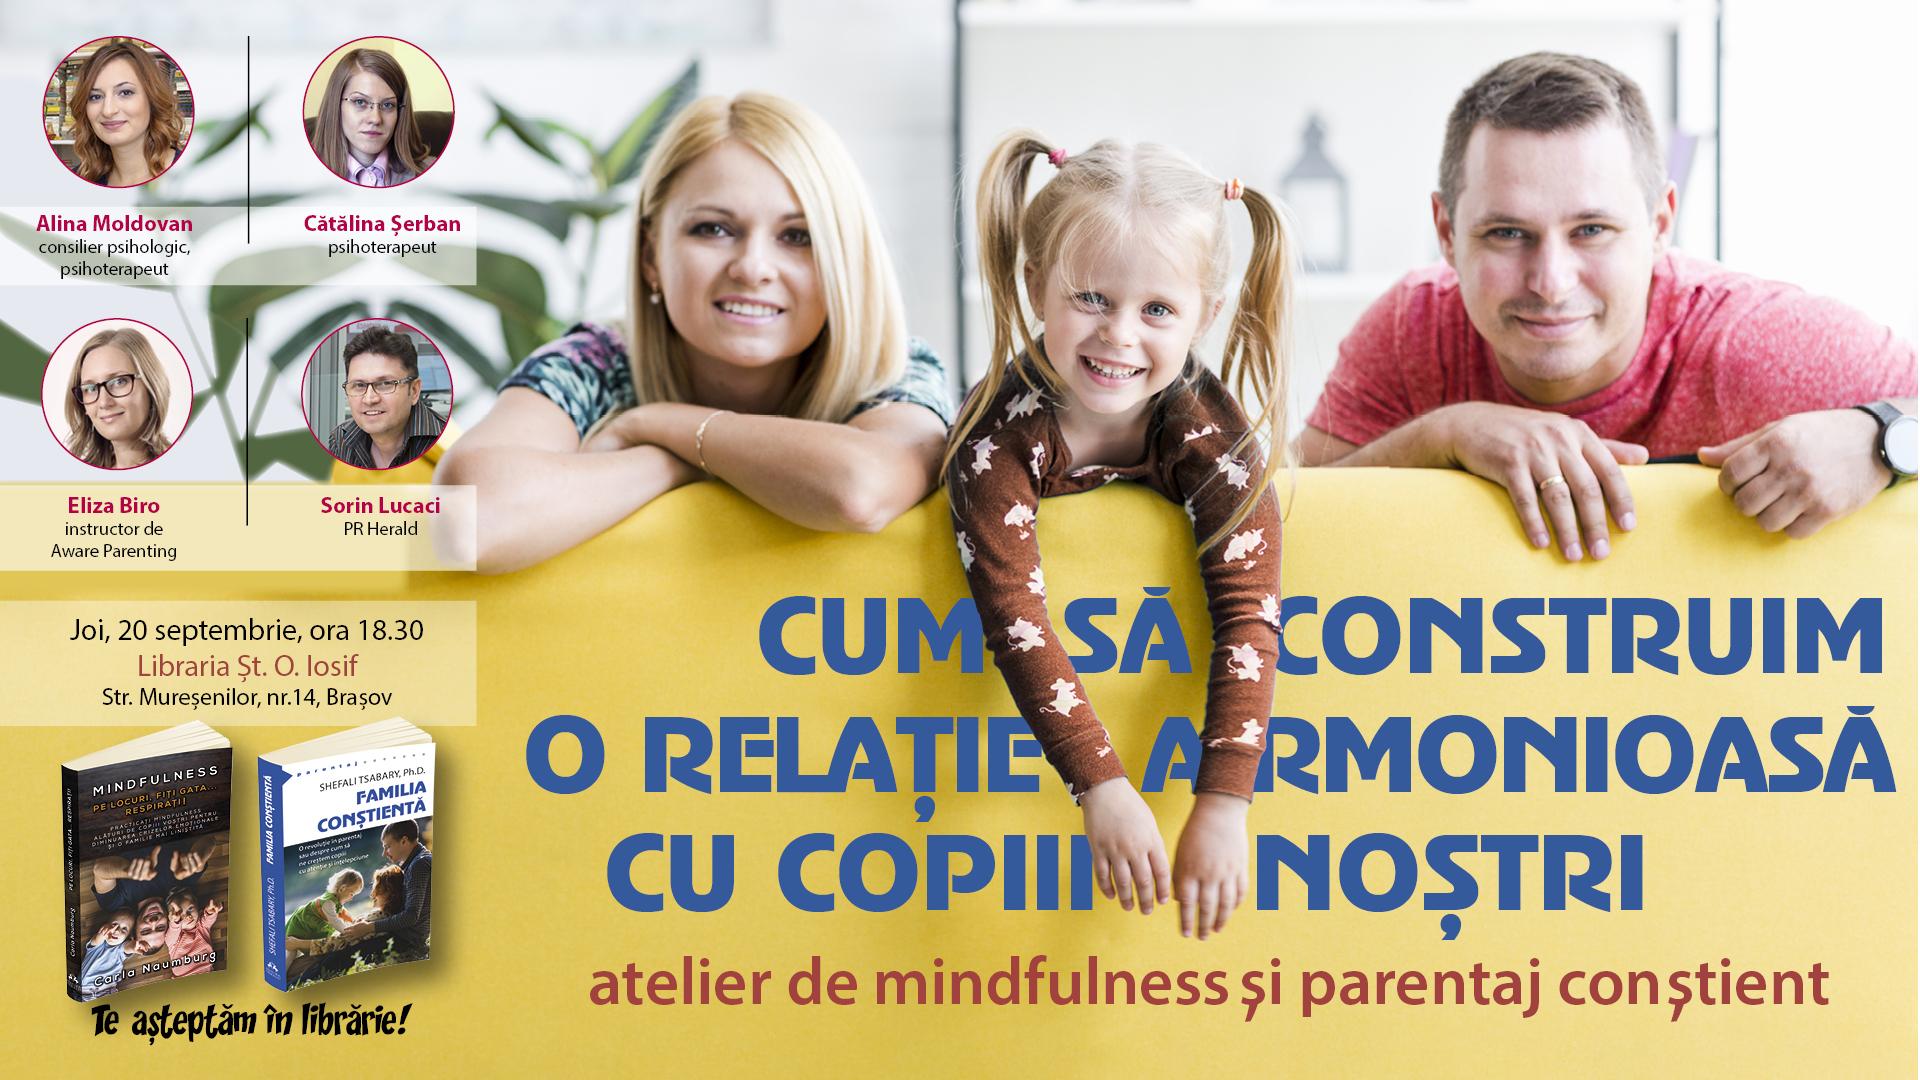 relatie armonioasa cu copiii nostri